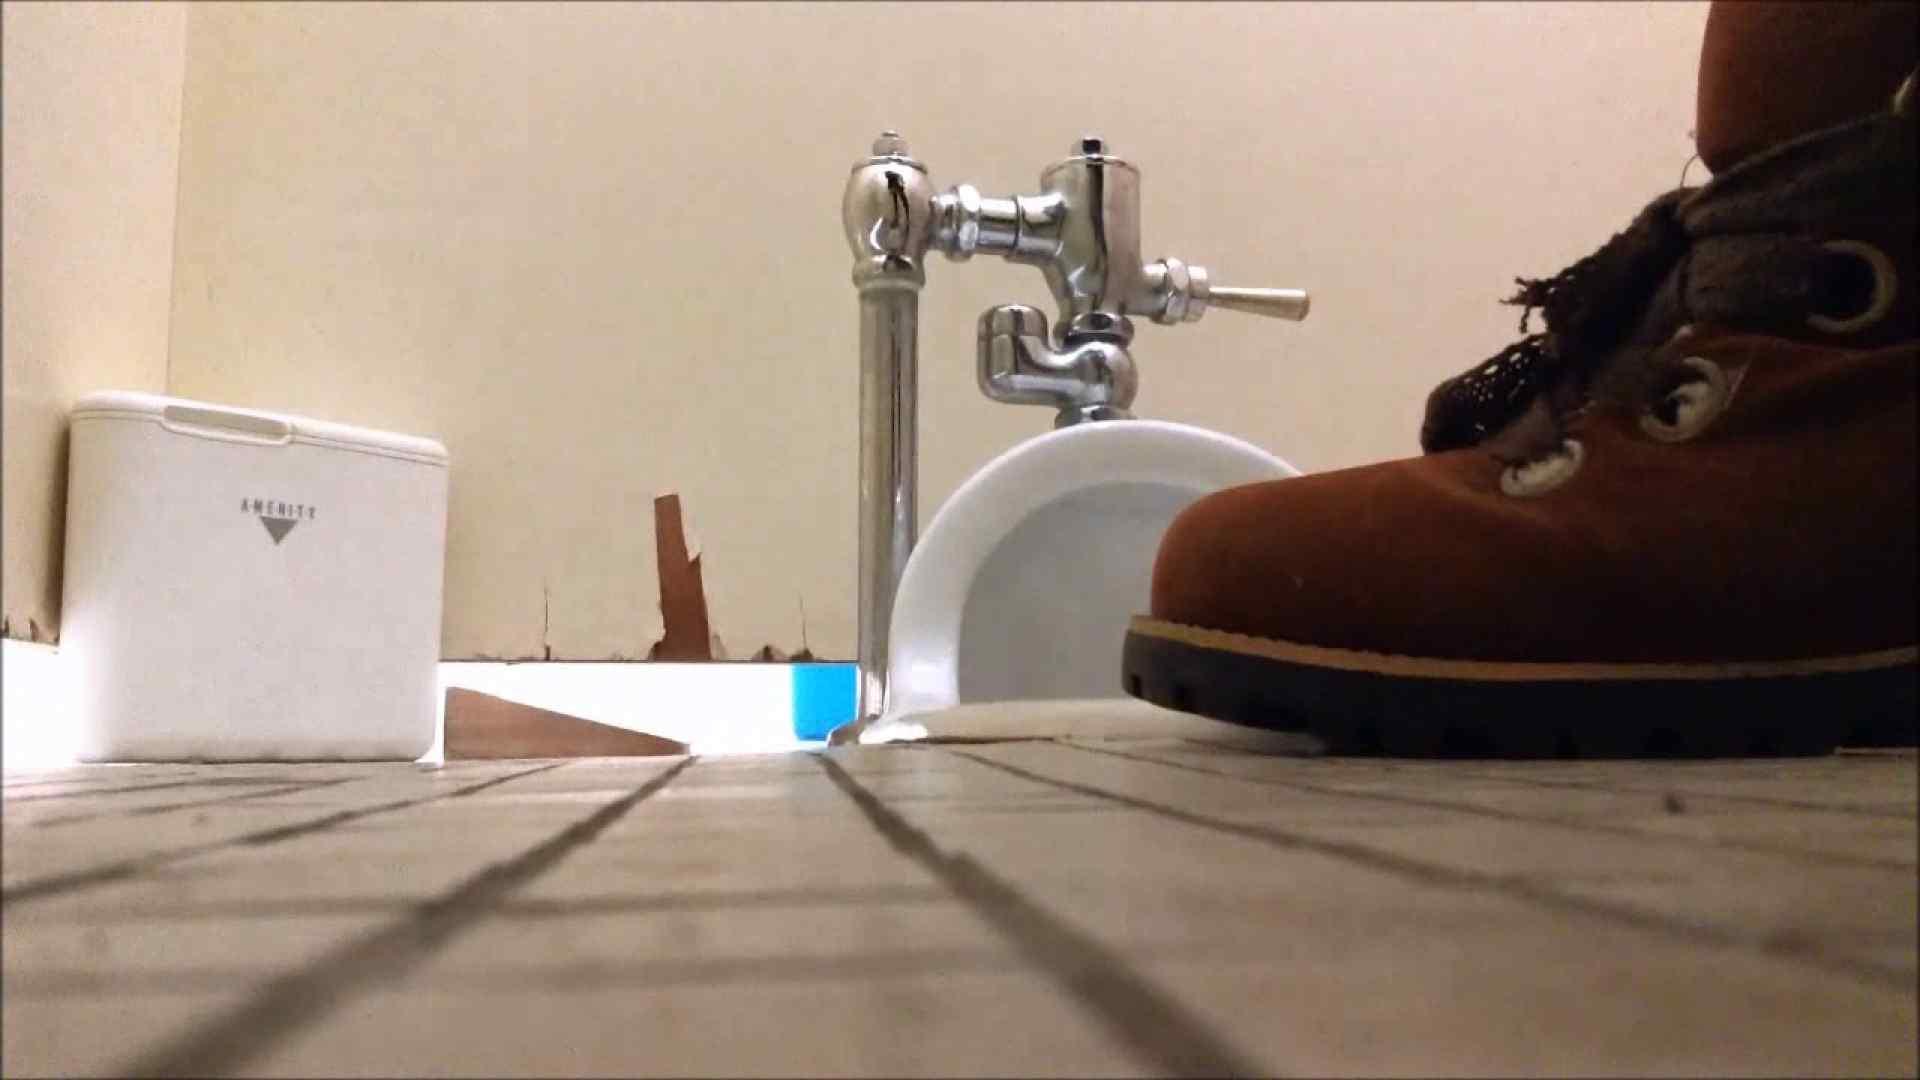 某有名大学女性洗面所 vol.09 洗面所 オメコ動画キャプチャ 78PIX 56